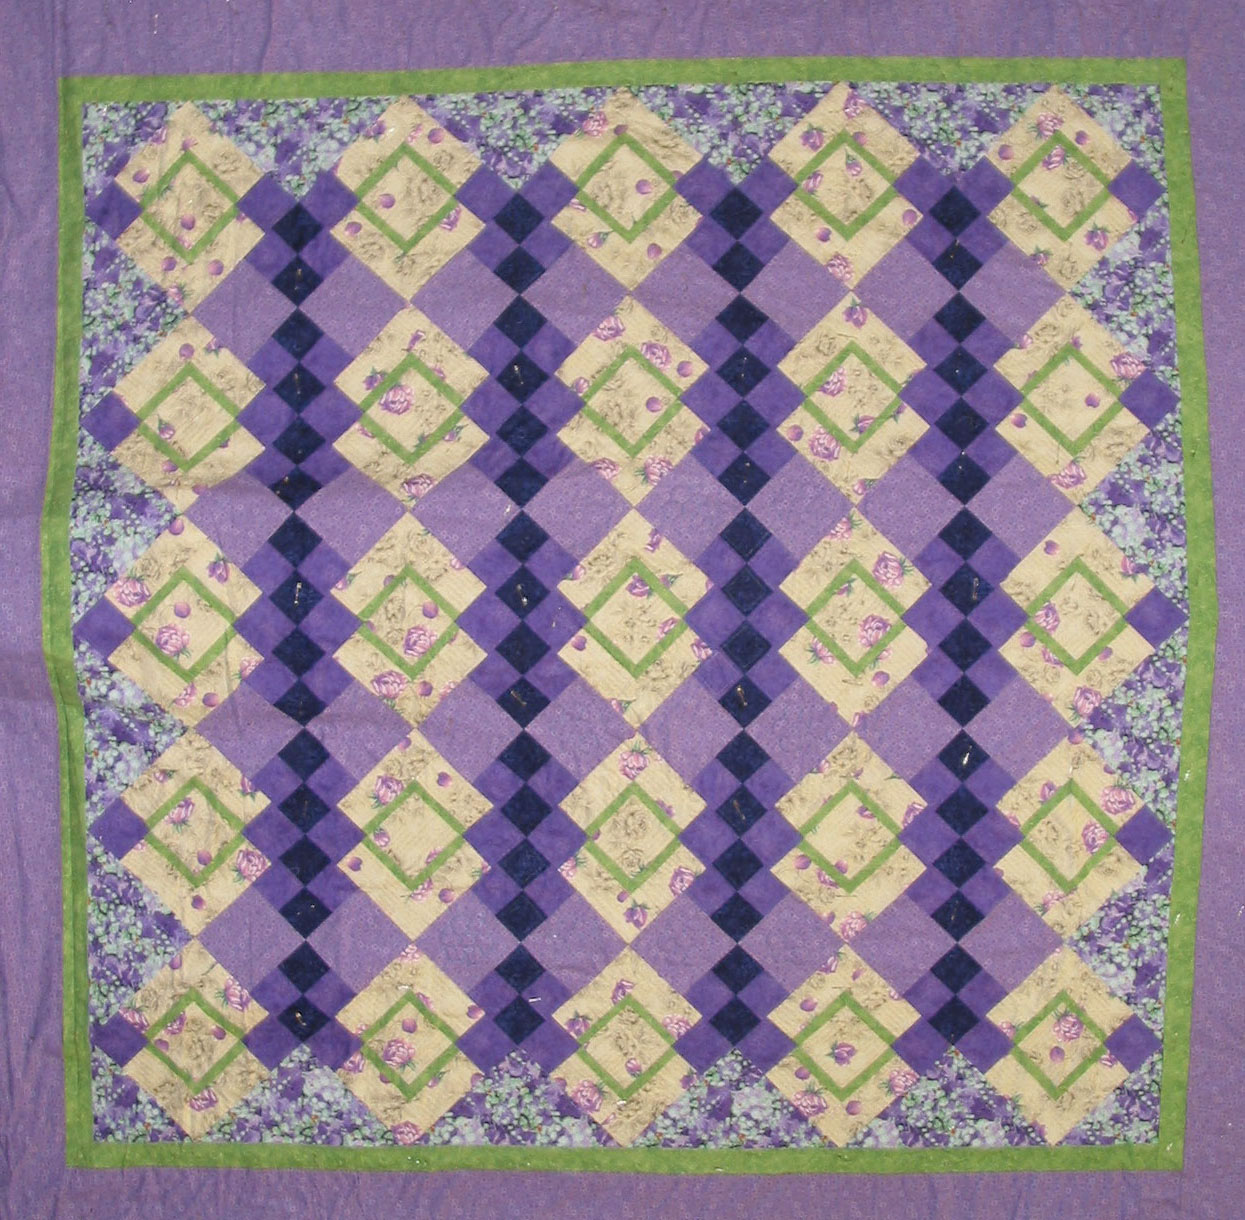 raffle quilt 2015 rotated.jpg